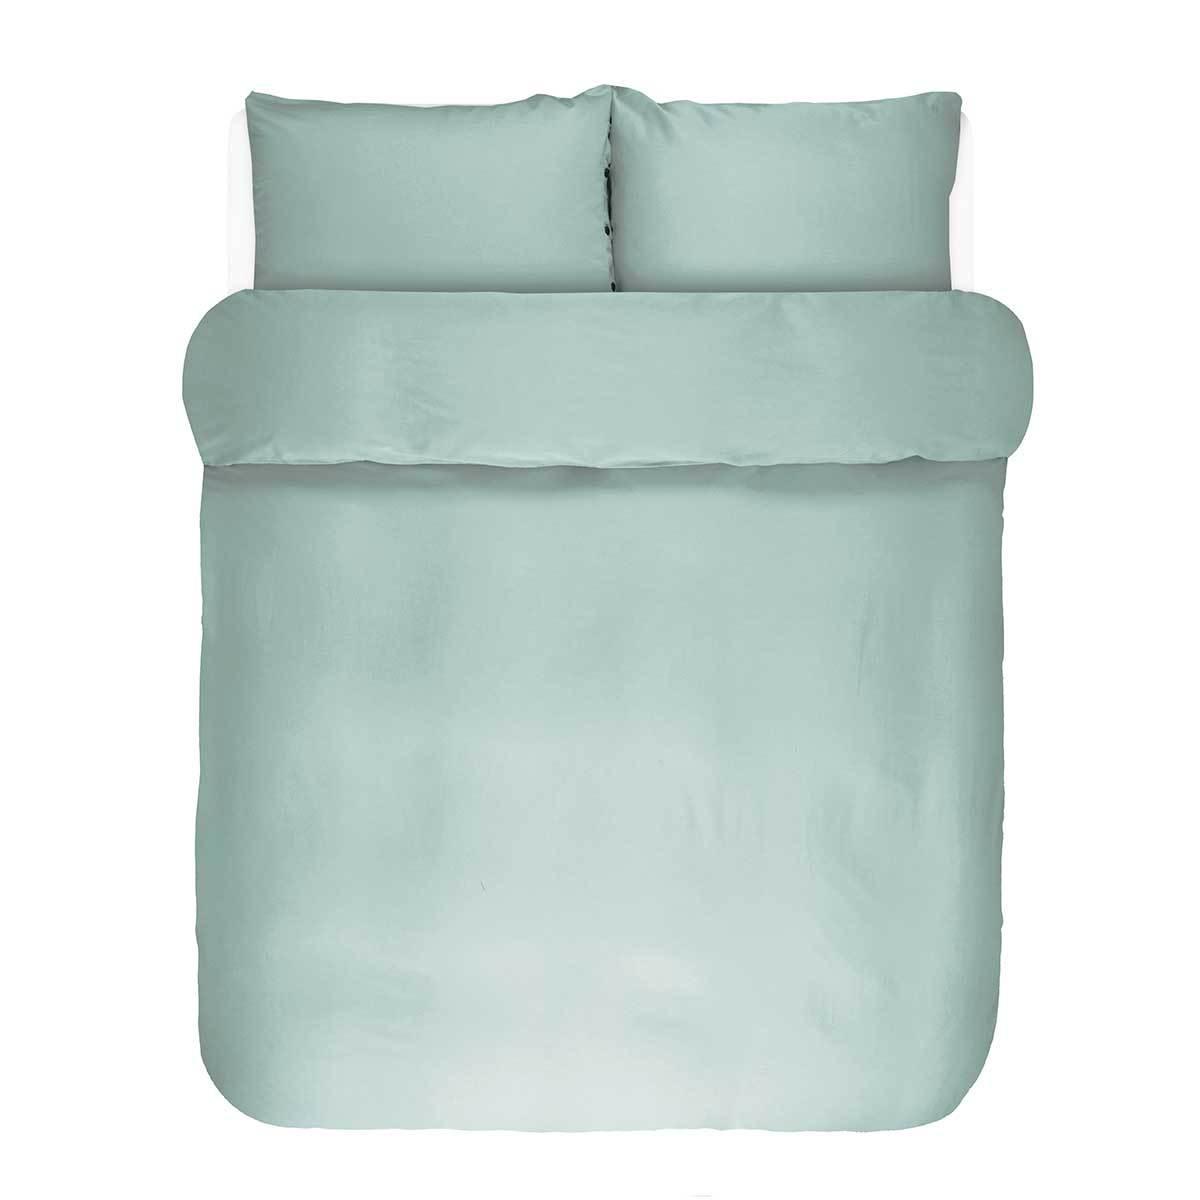 marc o polo tencel bettw sche vora aqua g nstig online. Black Bedroom Furniture Sets. Home Design Ideas